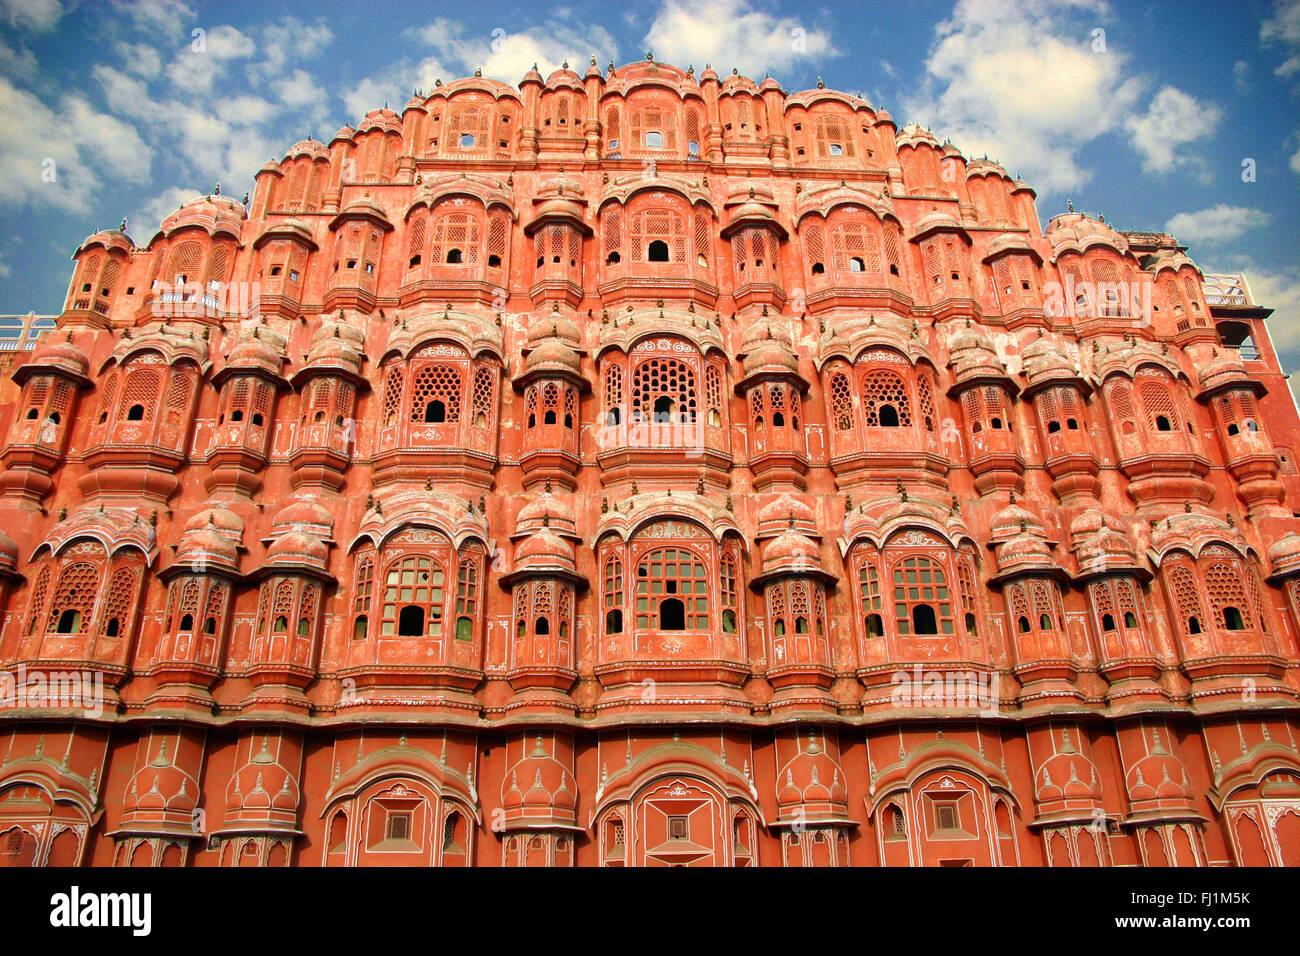 Hawa Mahal, Palace of Wind , Jaipur , Rajasthan , India (architecture) - Stock Image